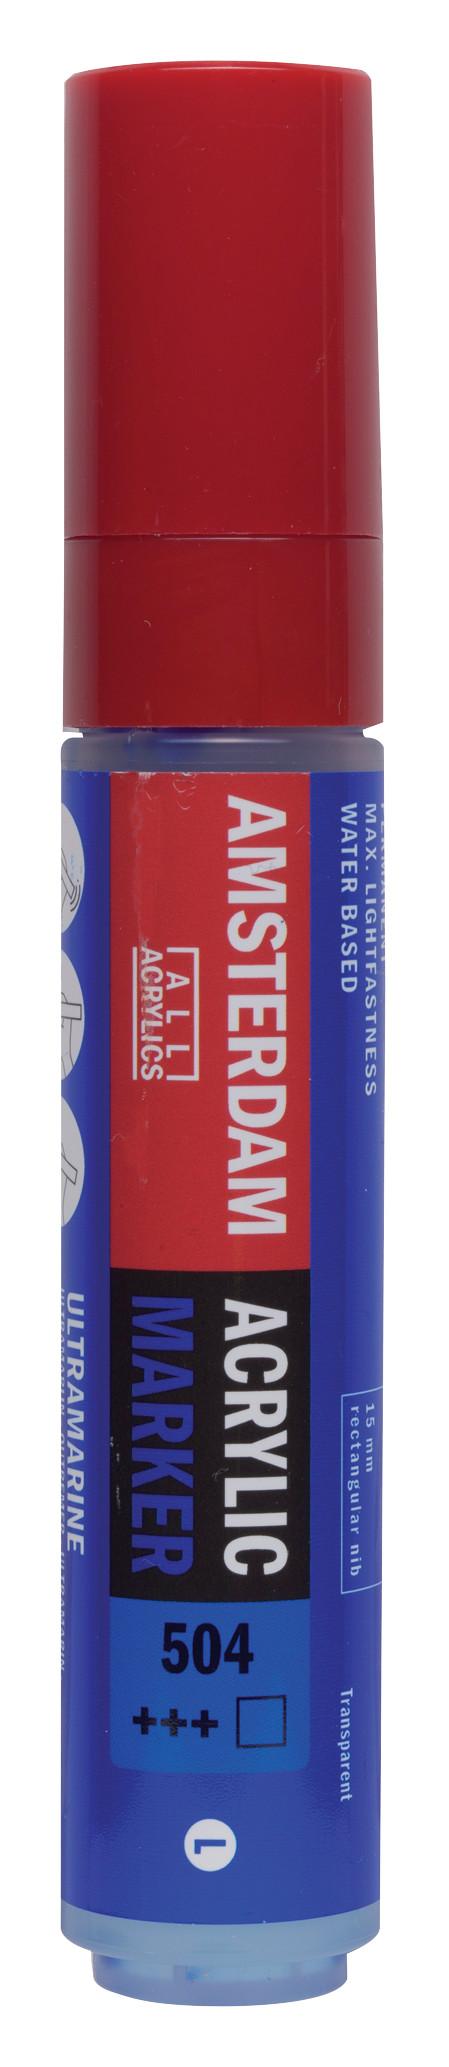 Amsterdam Acrylic Marker 15 mm Ultramarine 504